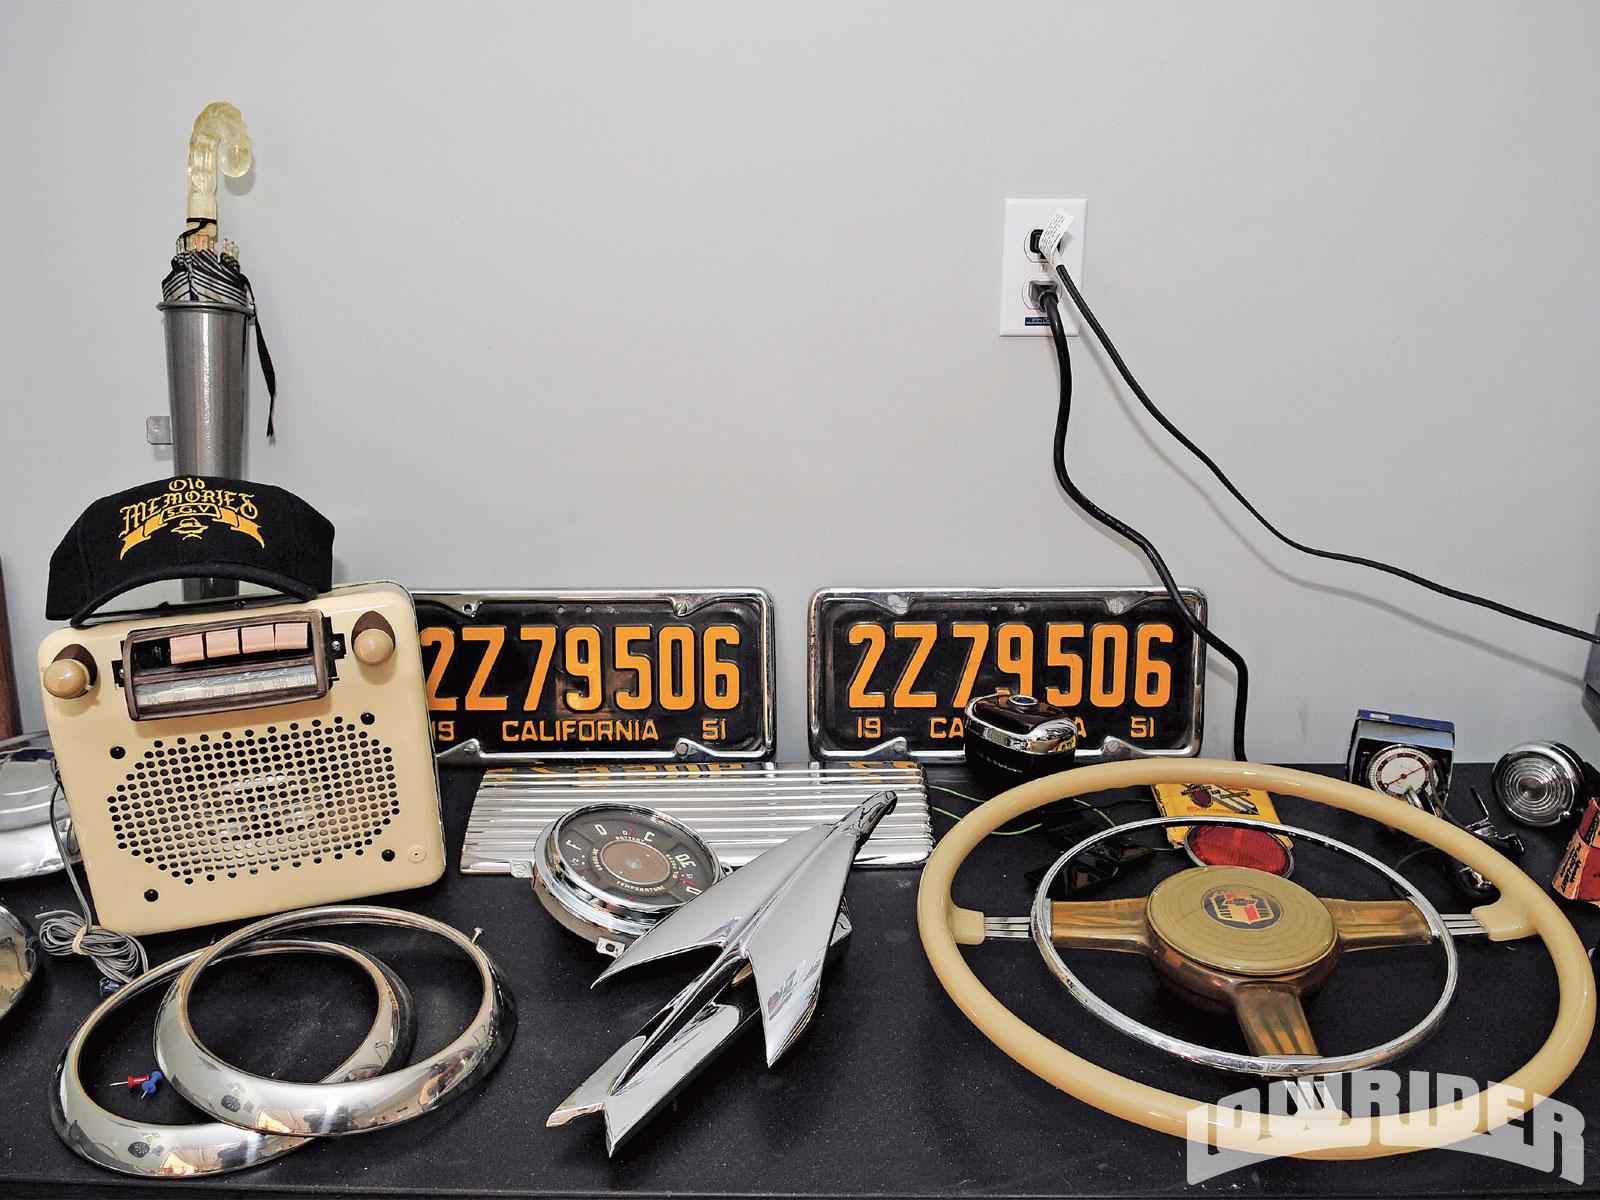 Magnificent Old School Car Parts Images - Classic Cars Ideas - boiq.info